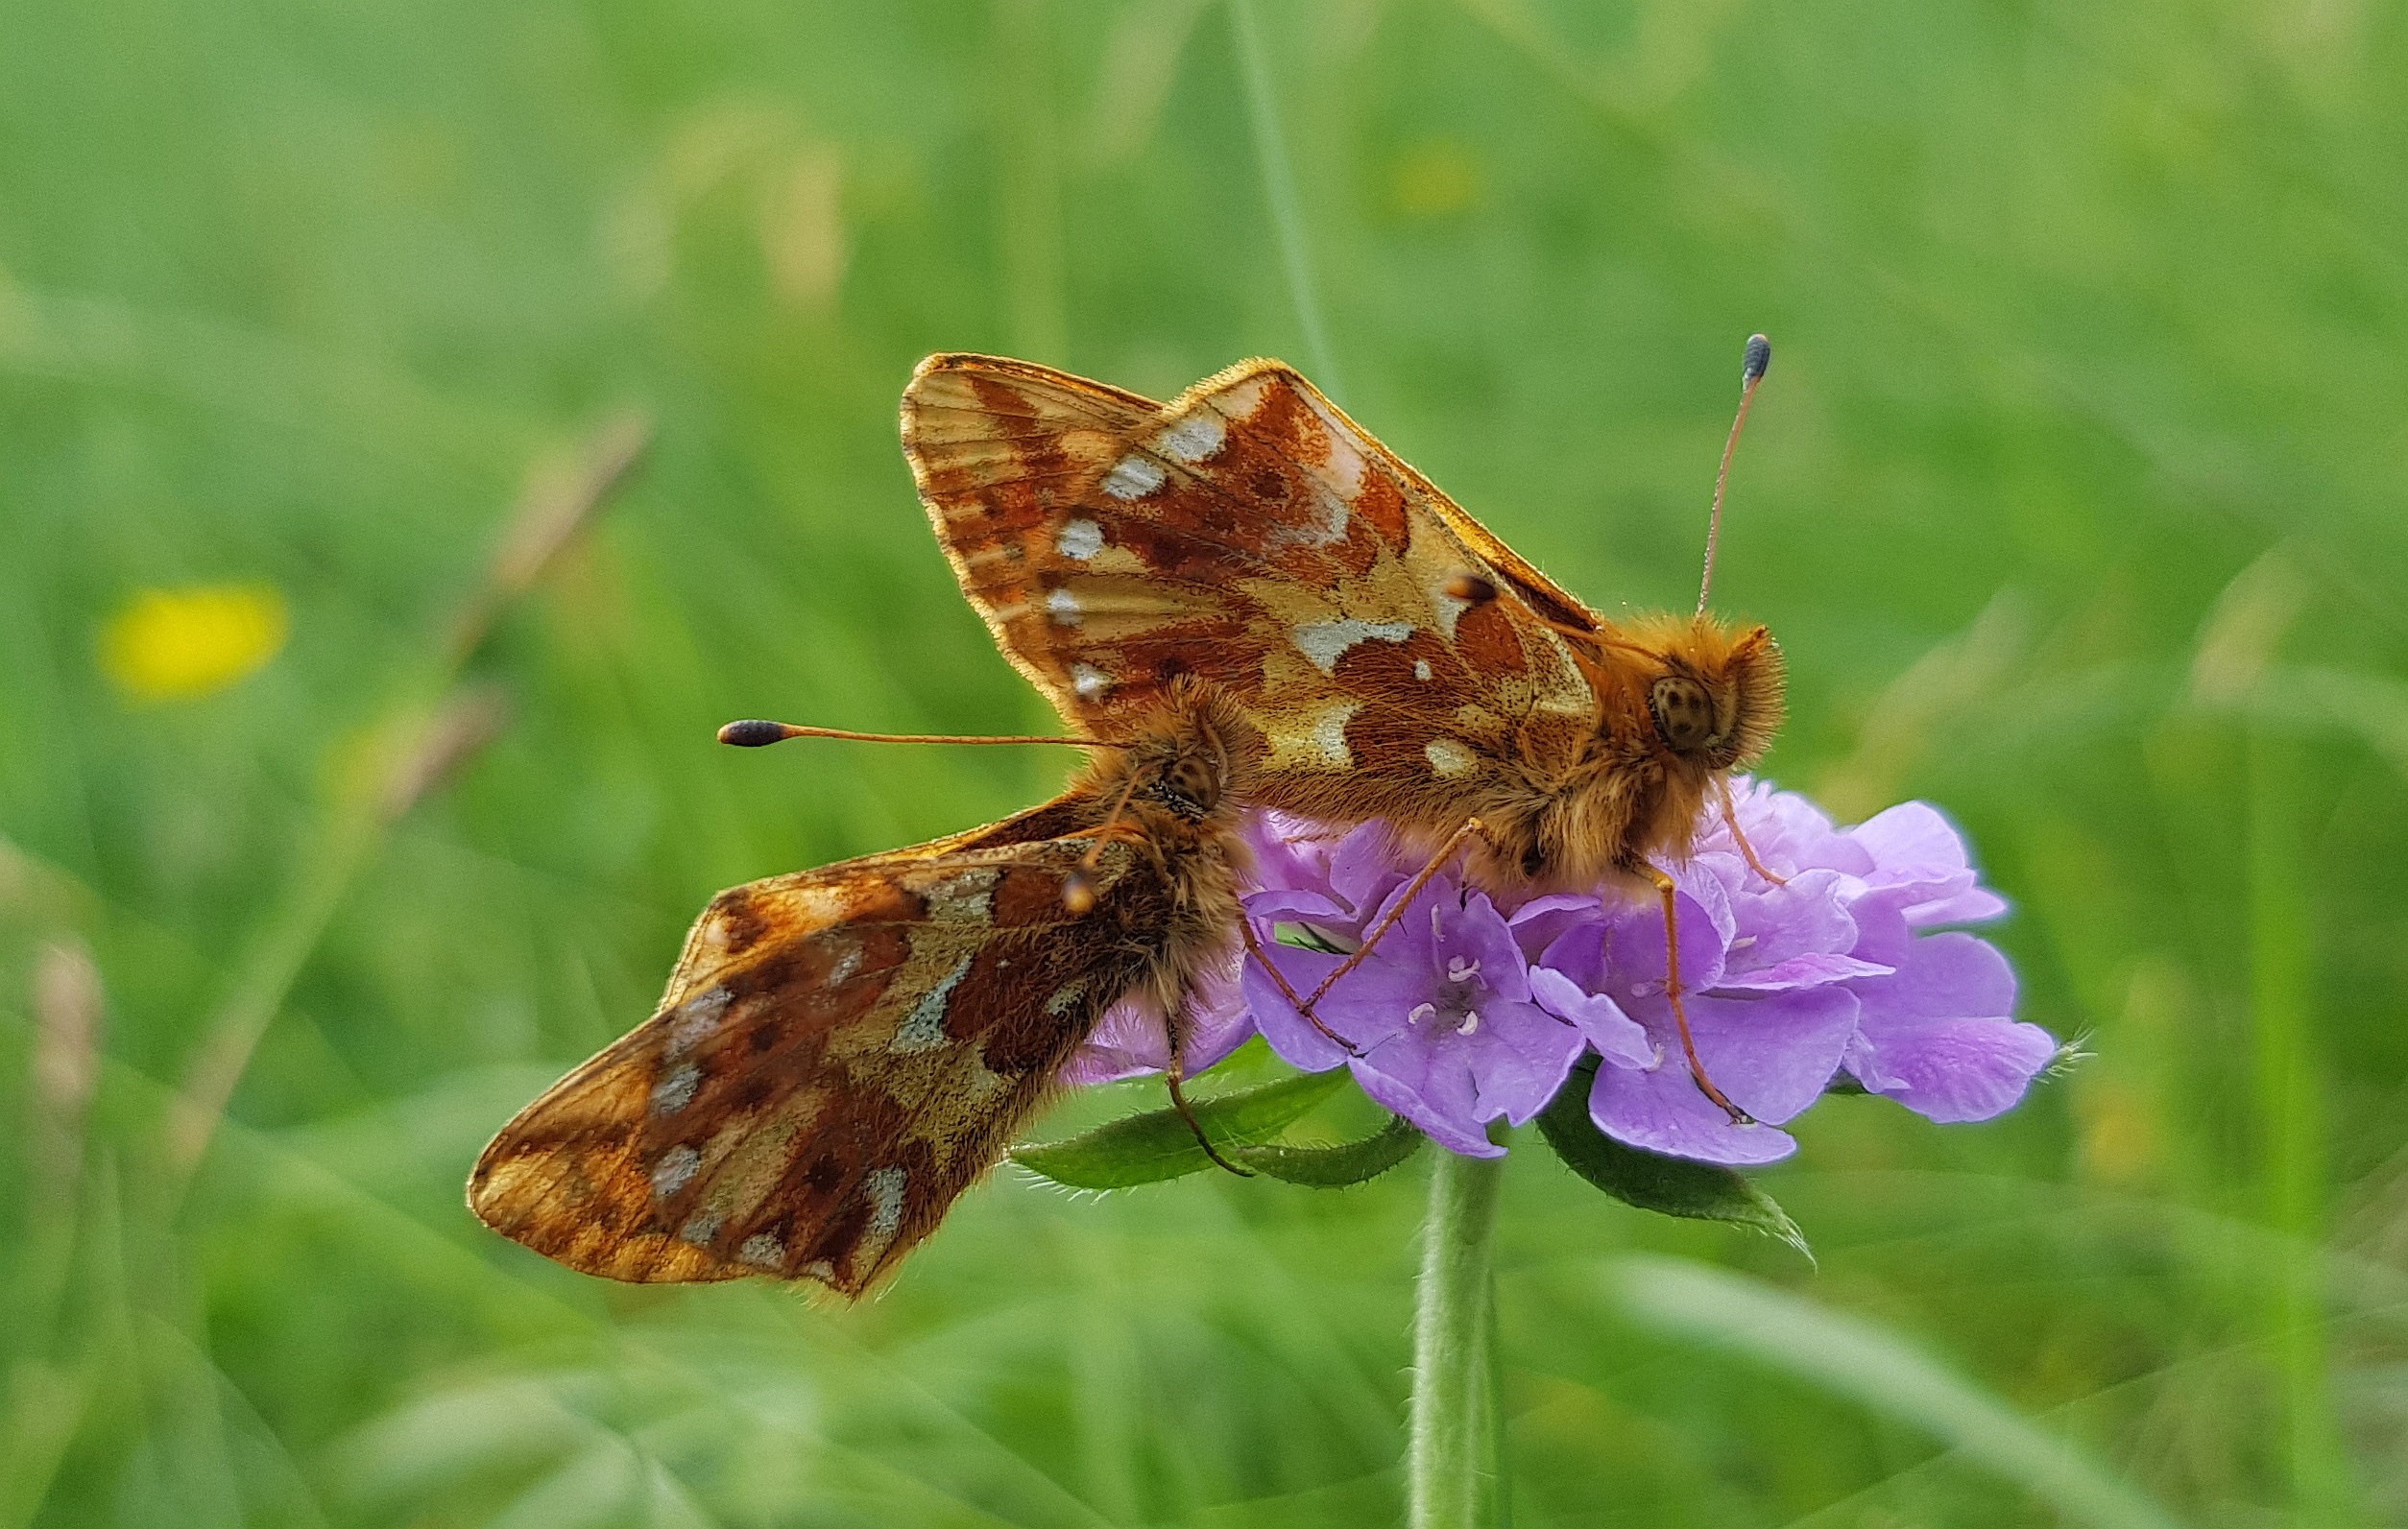 Predavanje Lepidopterolog dr. Jan Carnelutti - 100-letnica rojstva